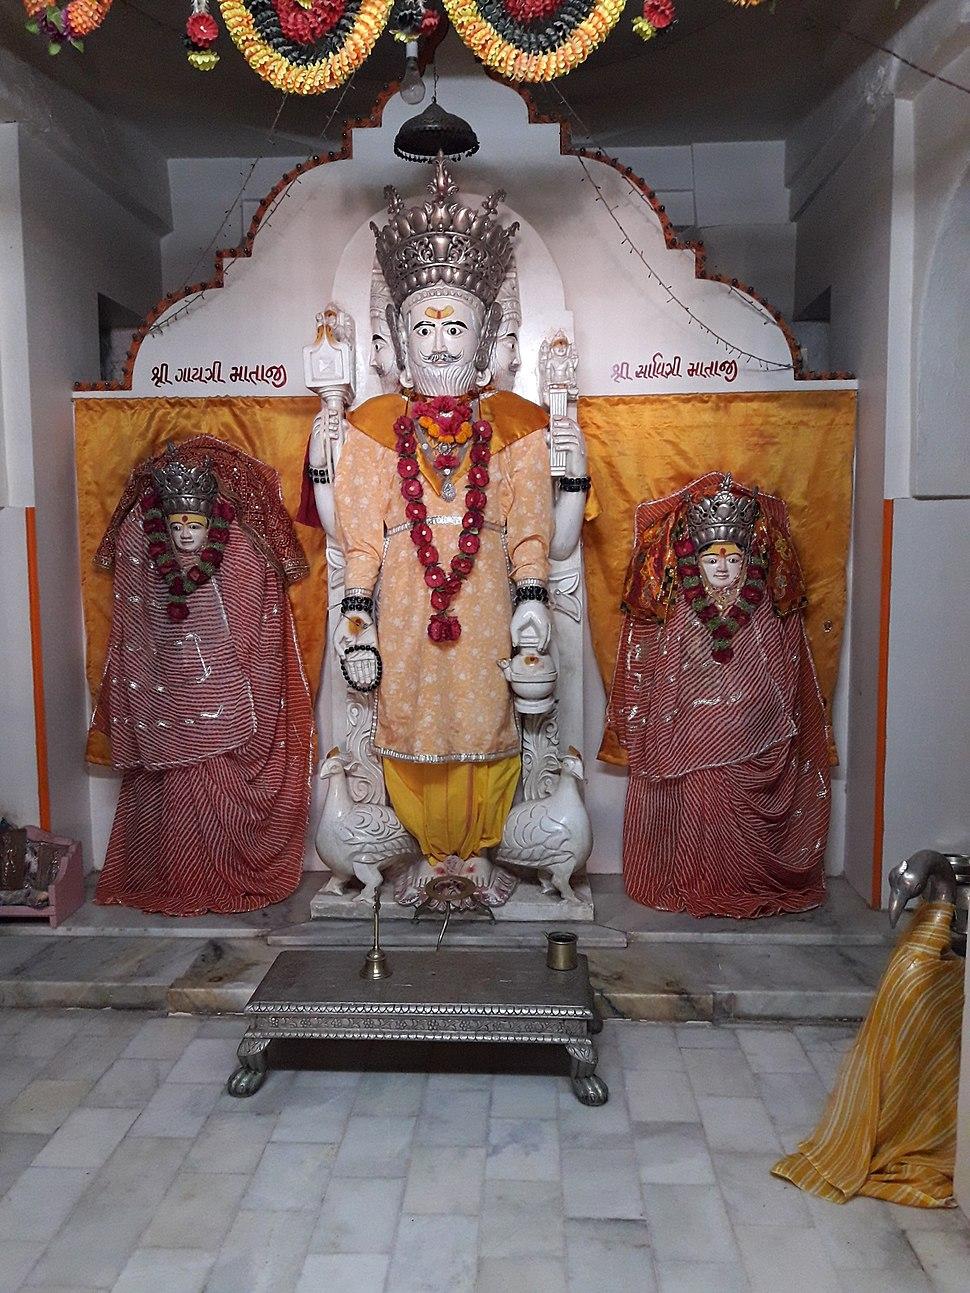 Brahmaji Temple of Khedbrahma8